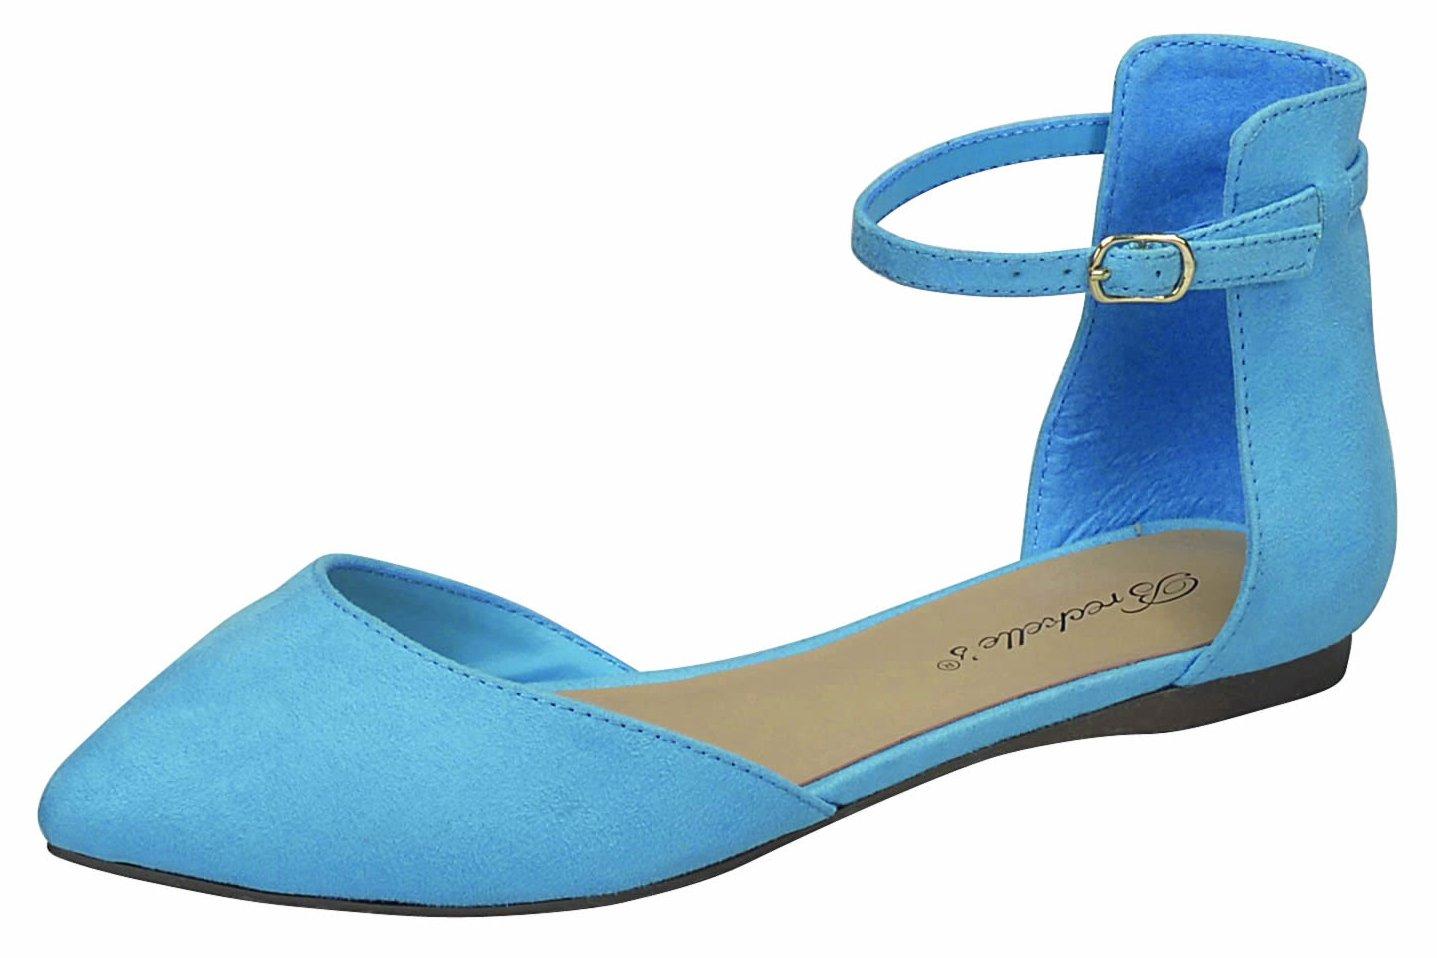 Breckelle's Women's d'Orsay Pointy Toe Ankle Strap Buckle Ballet Flat B01N7VA1BI 7.5 B(M) US|Blue